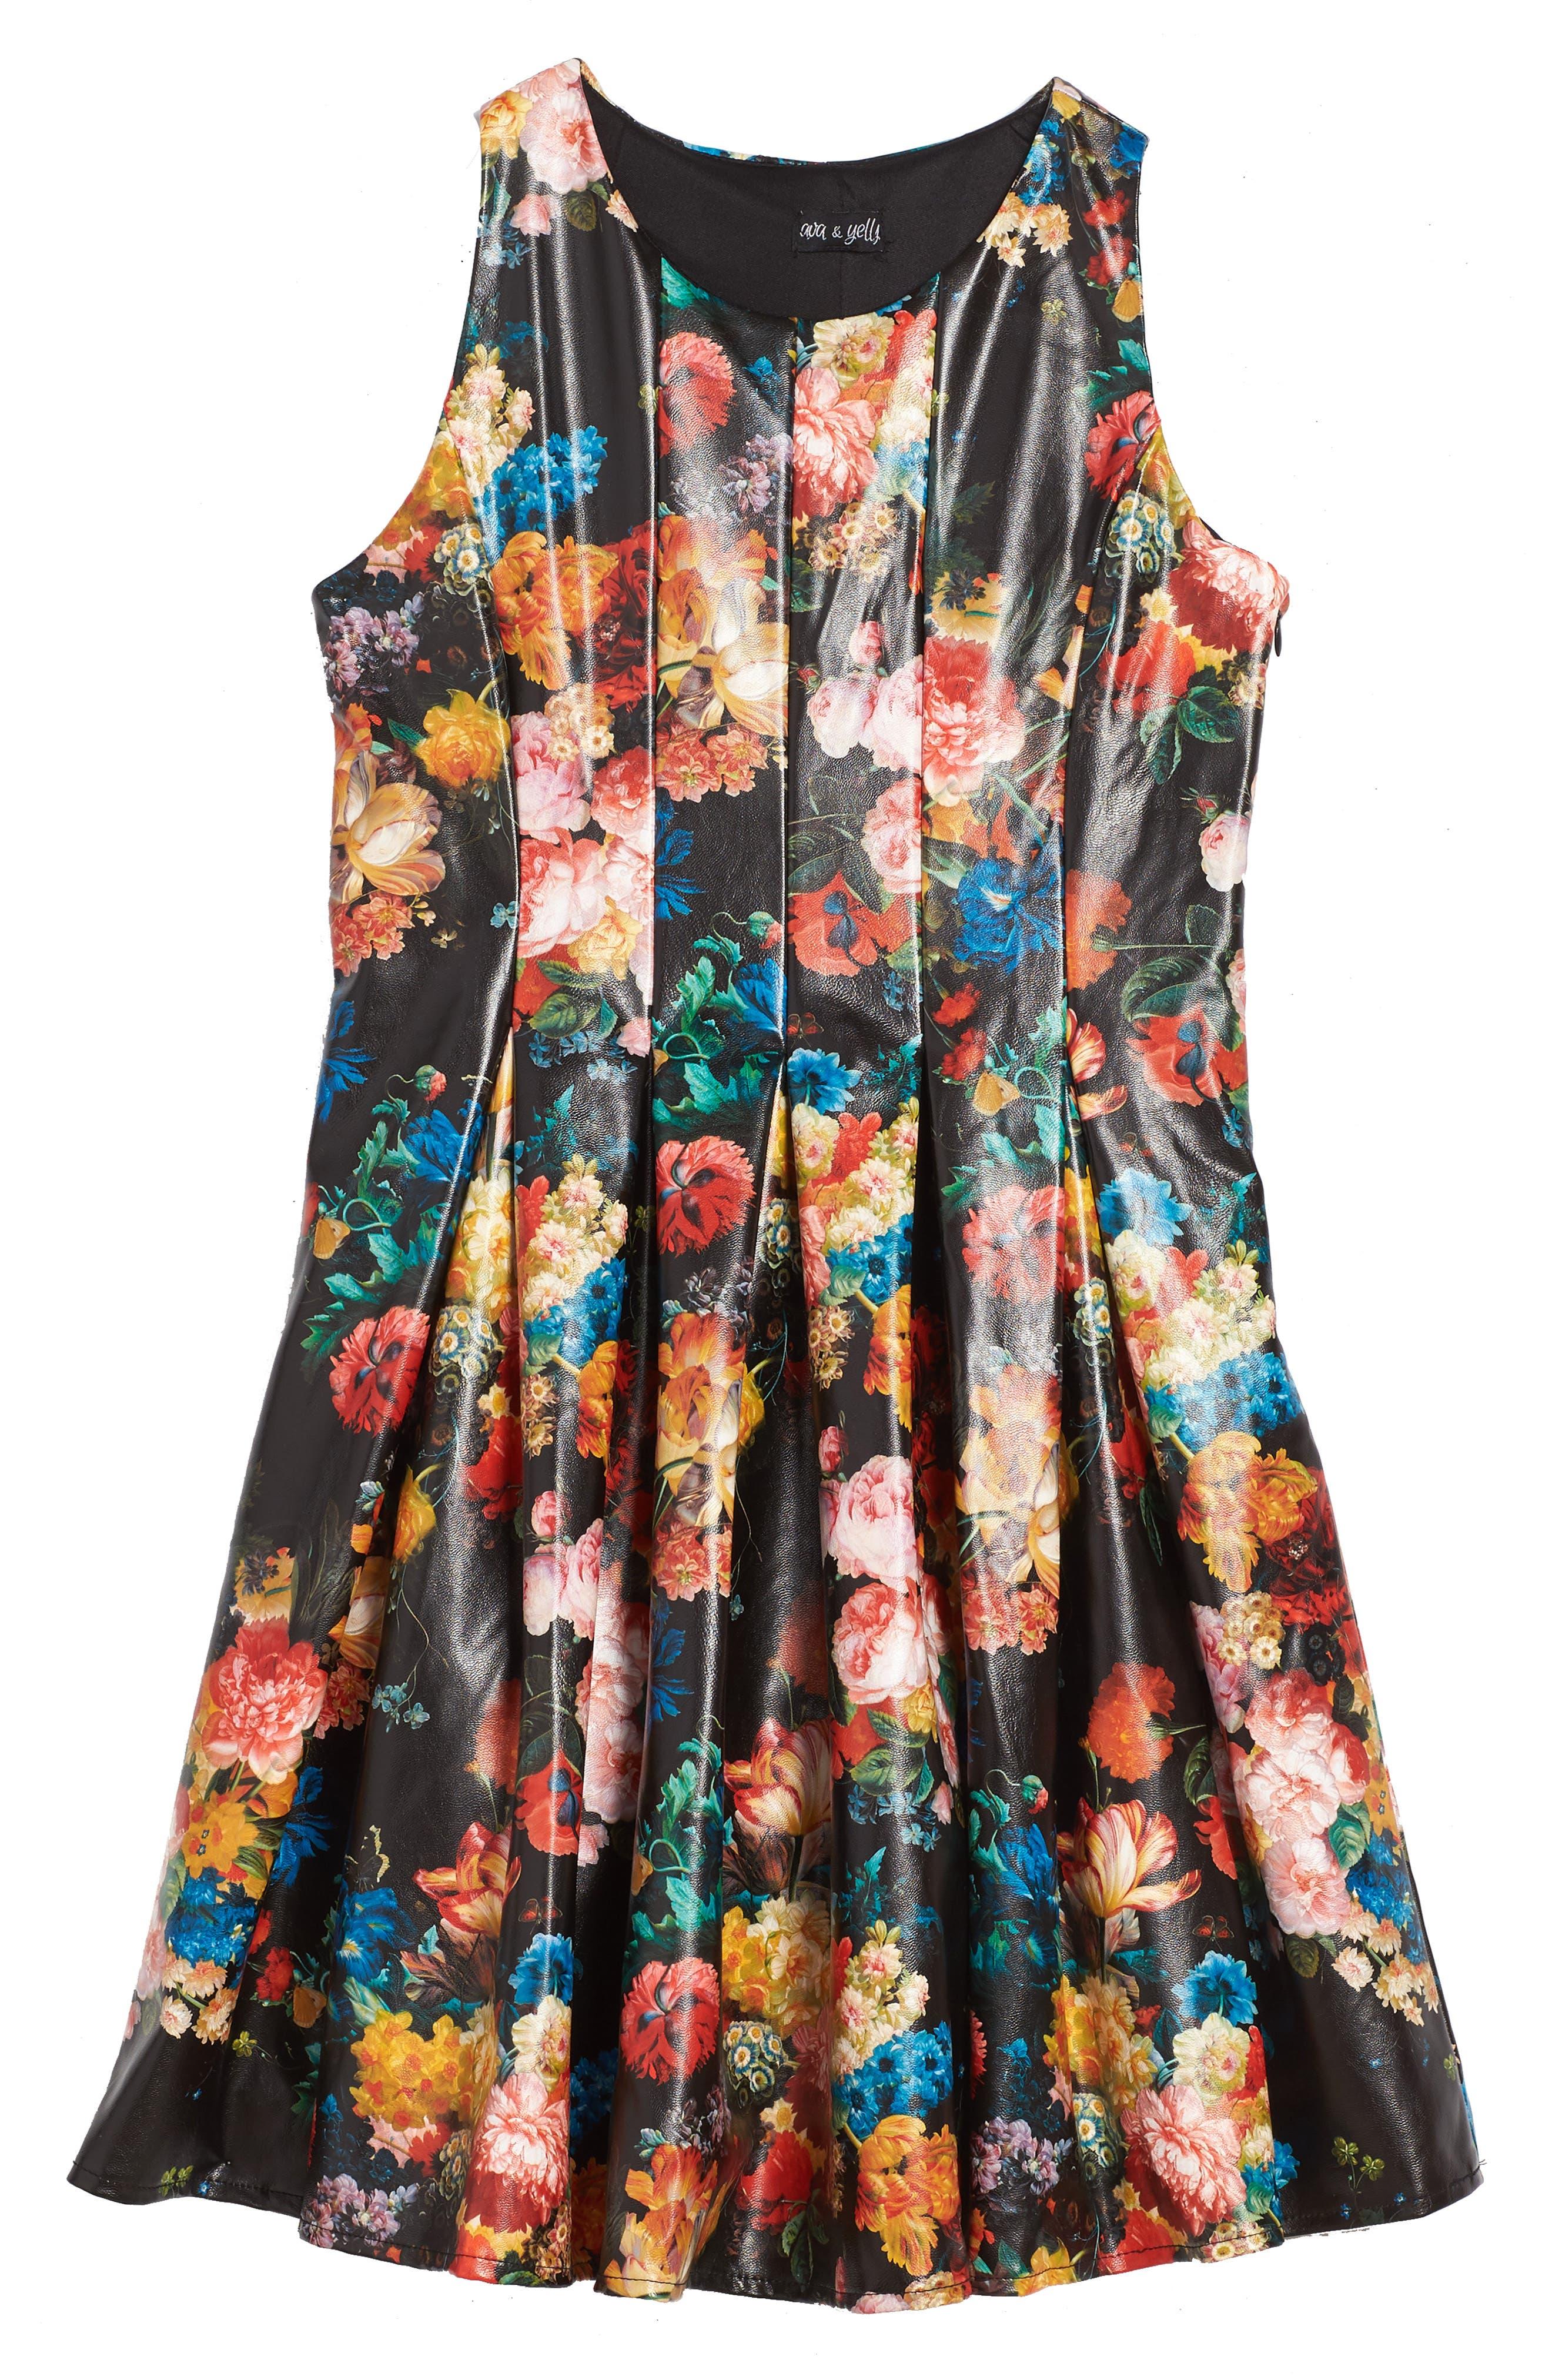 Main Image - Ava & Yelly Floral Print Skater Dress (Big Girls)